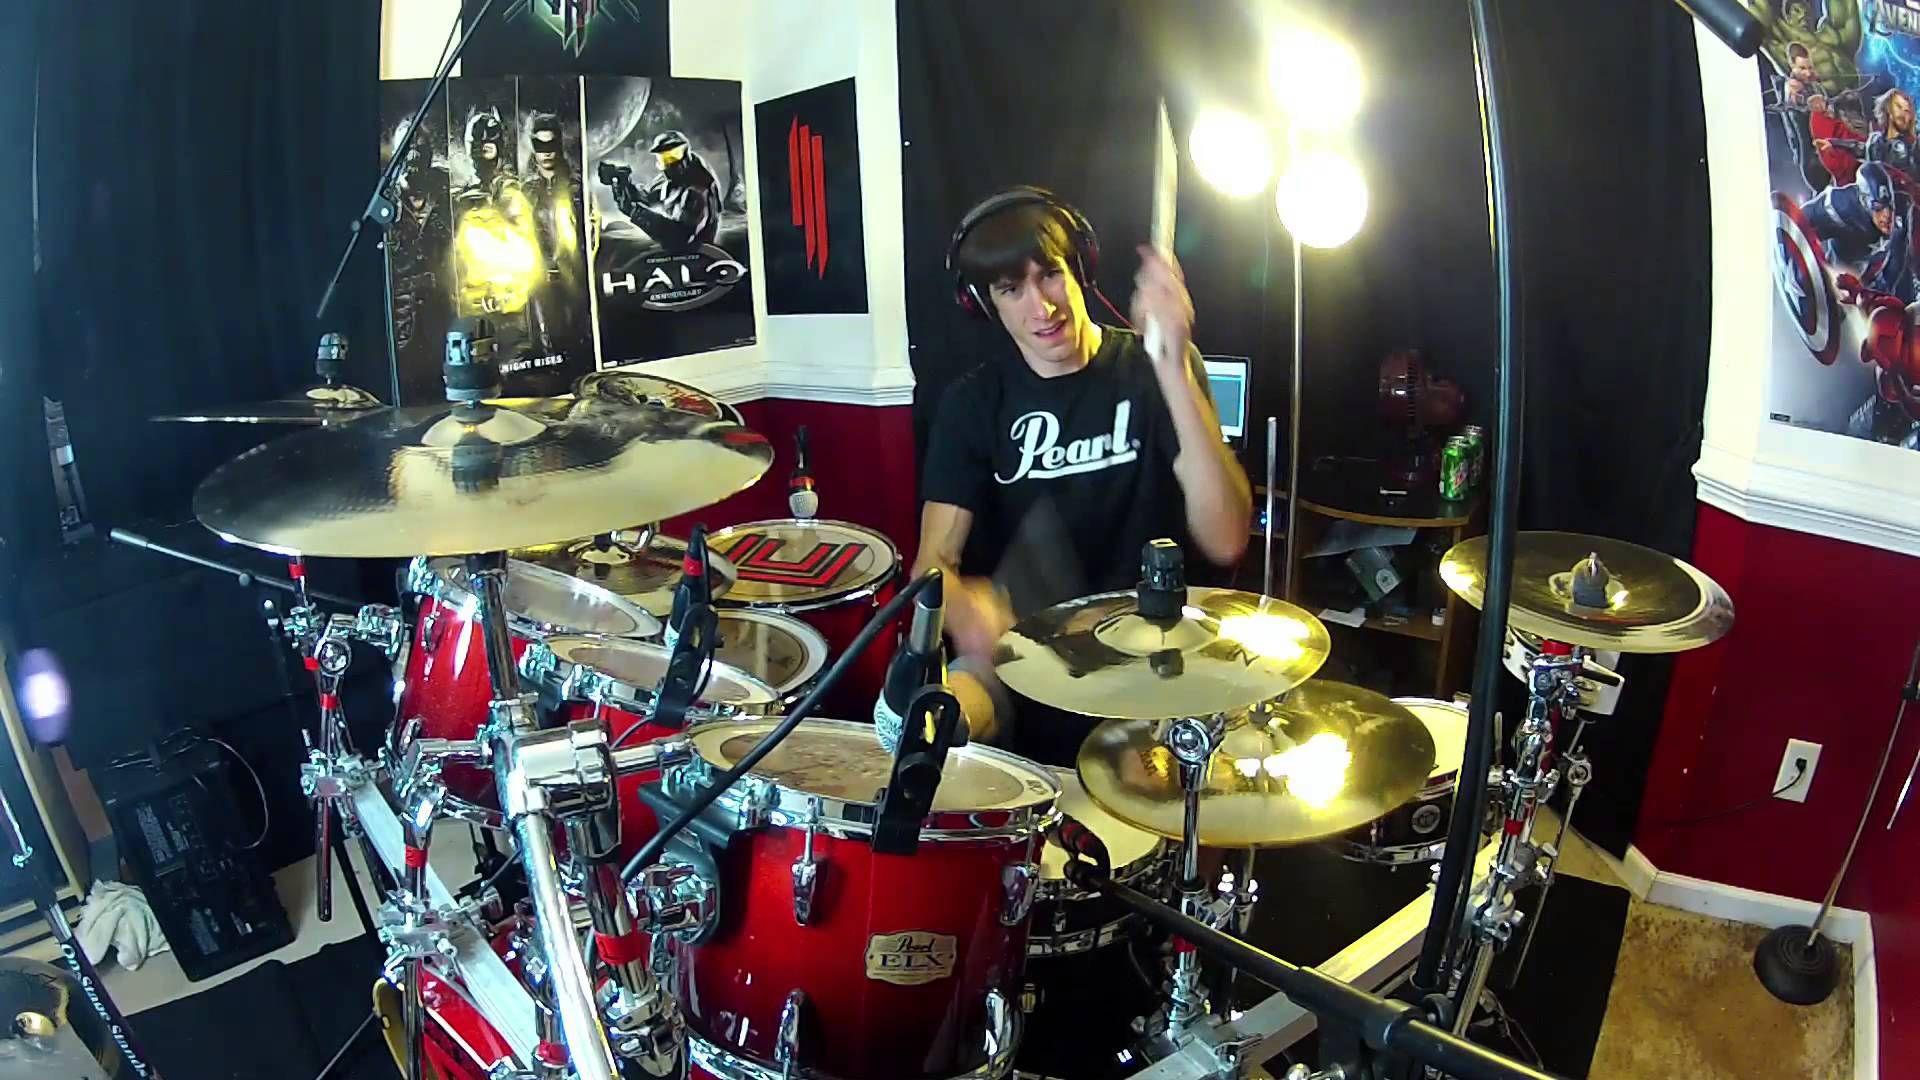 Rush Drum Cover Yyz Tom Sawyer Spirit Of Radio Red